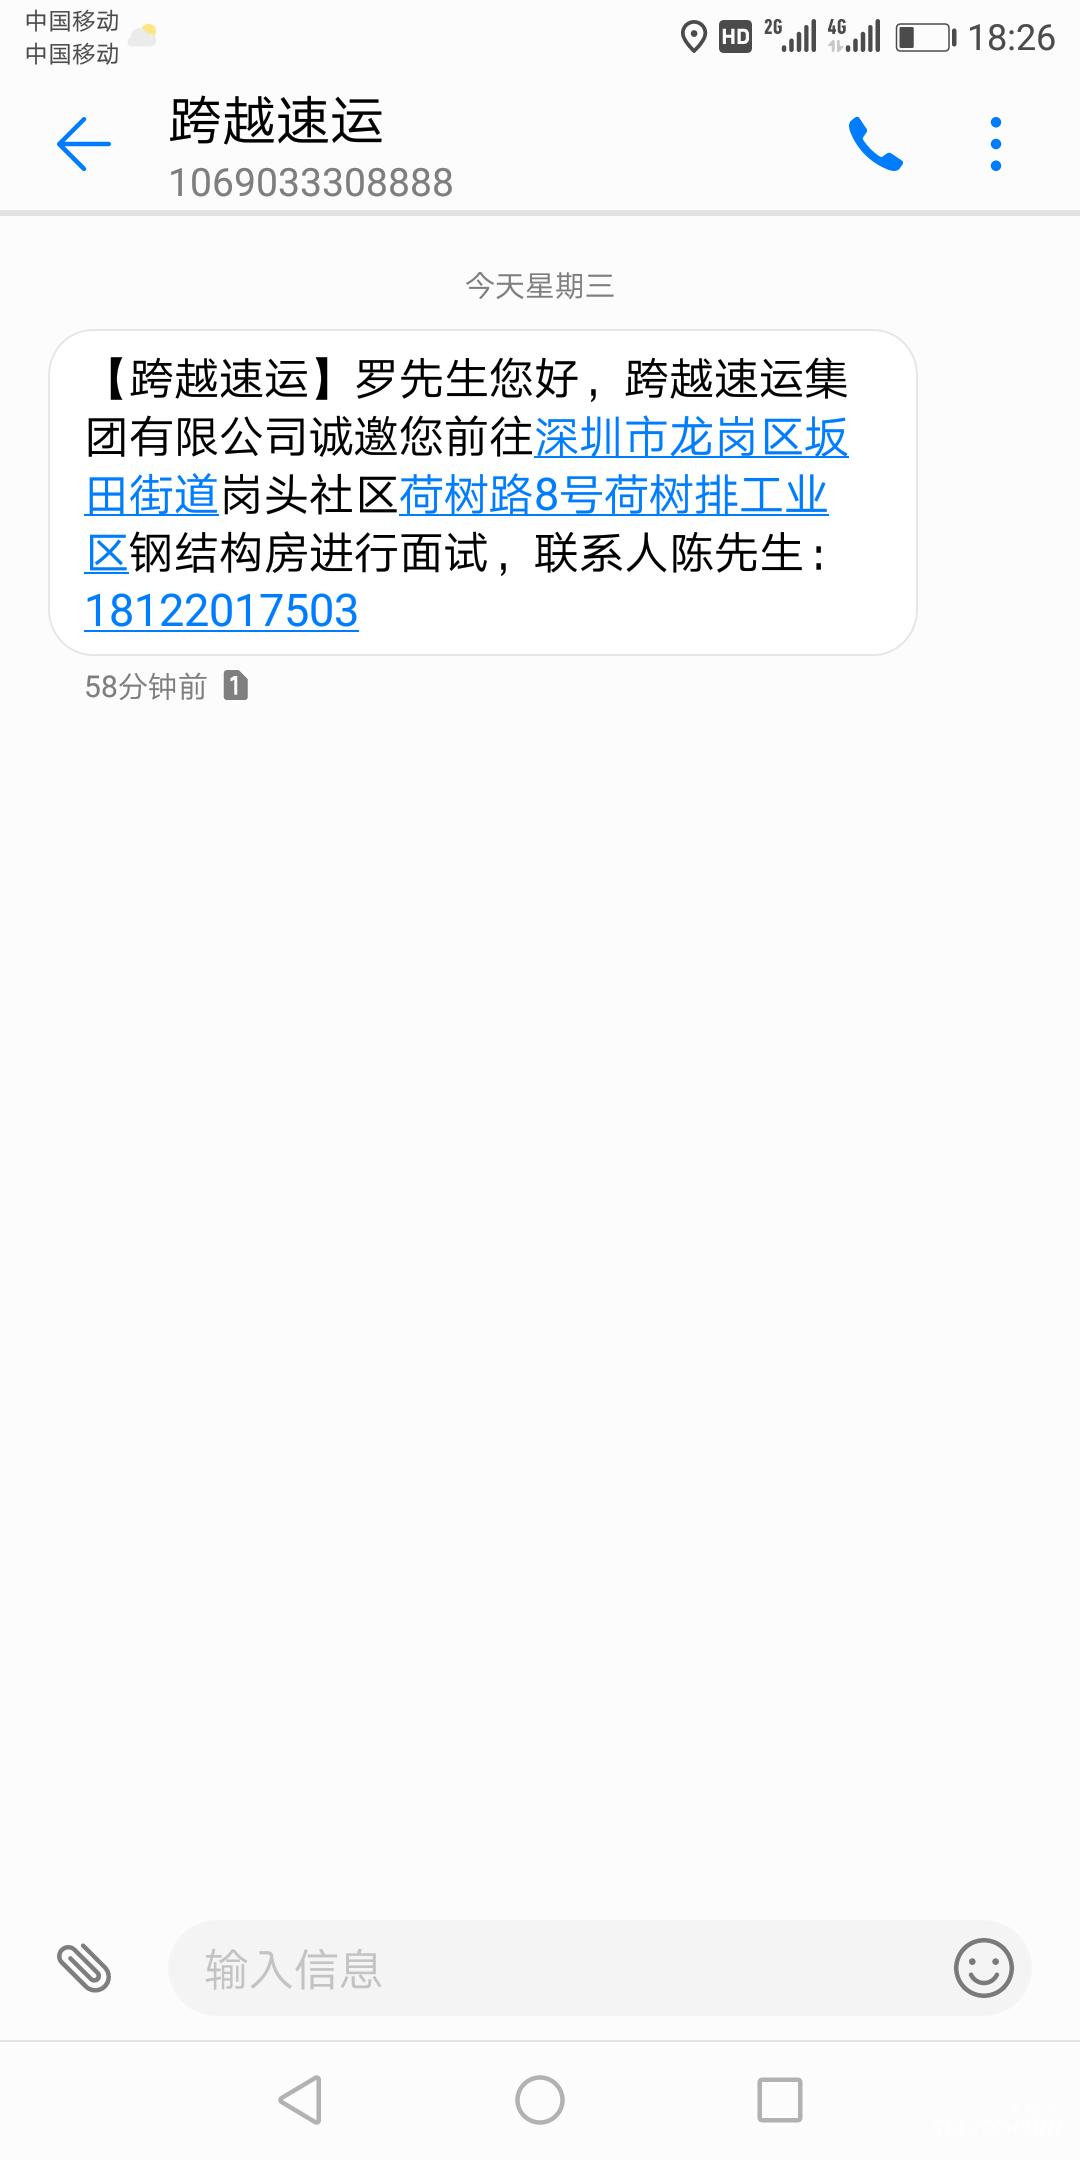 wechat_upload15198144325a9687203f4a9